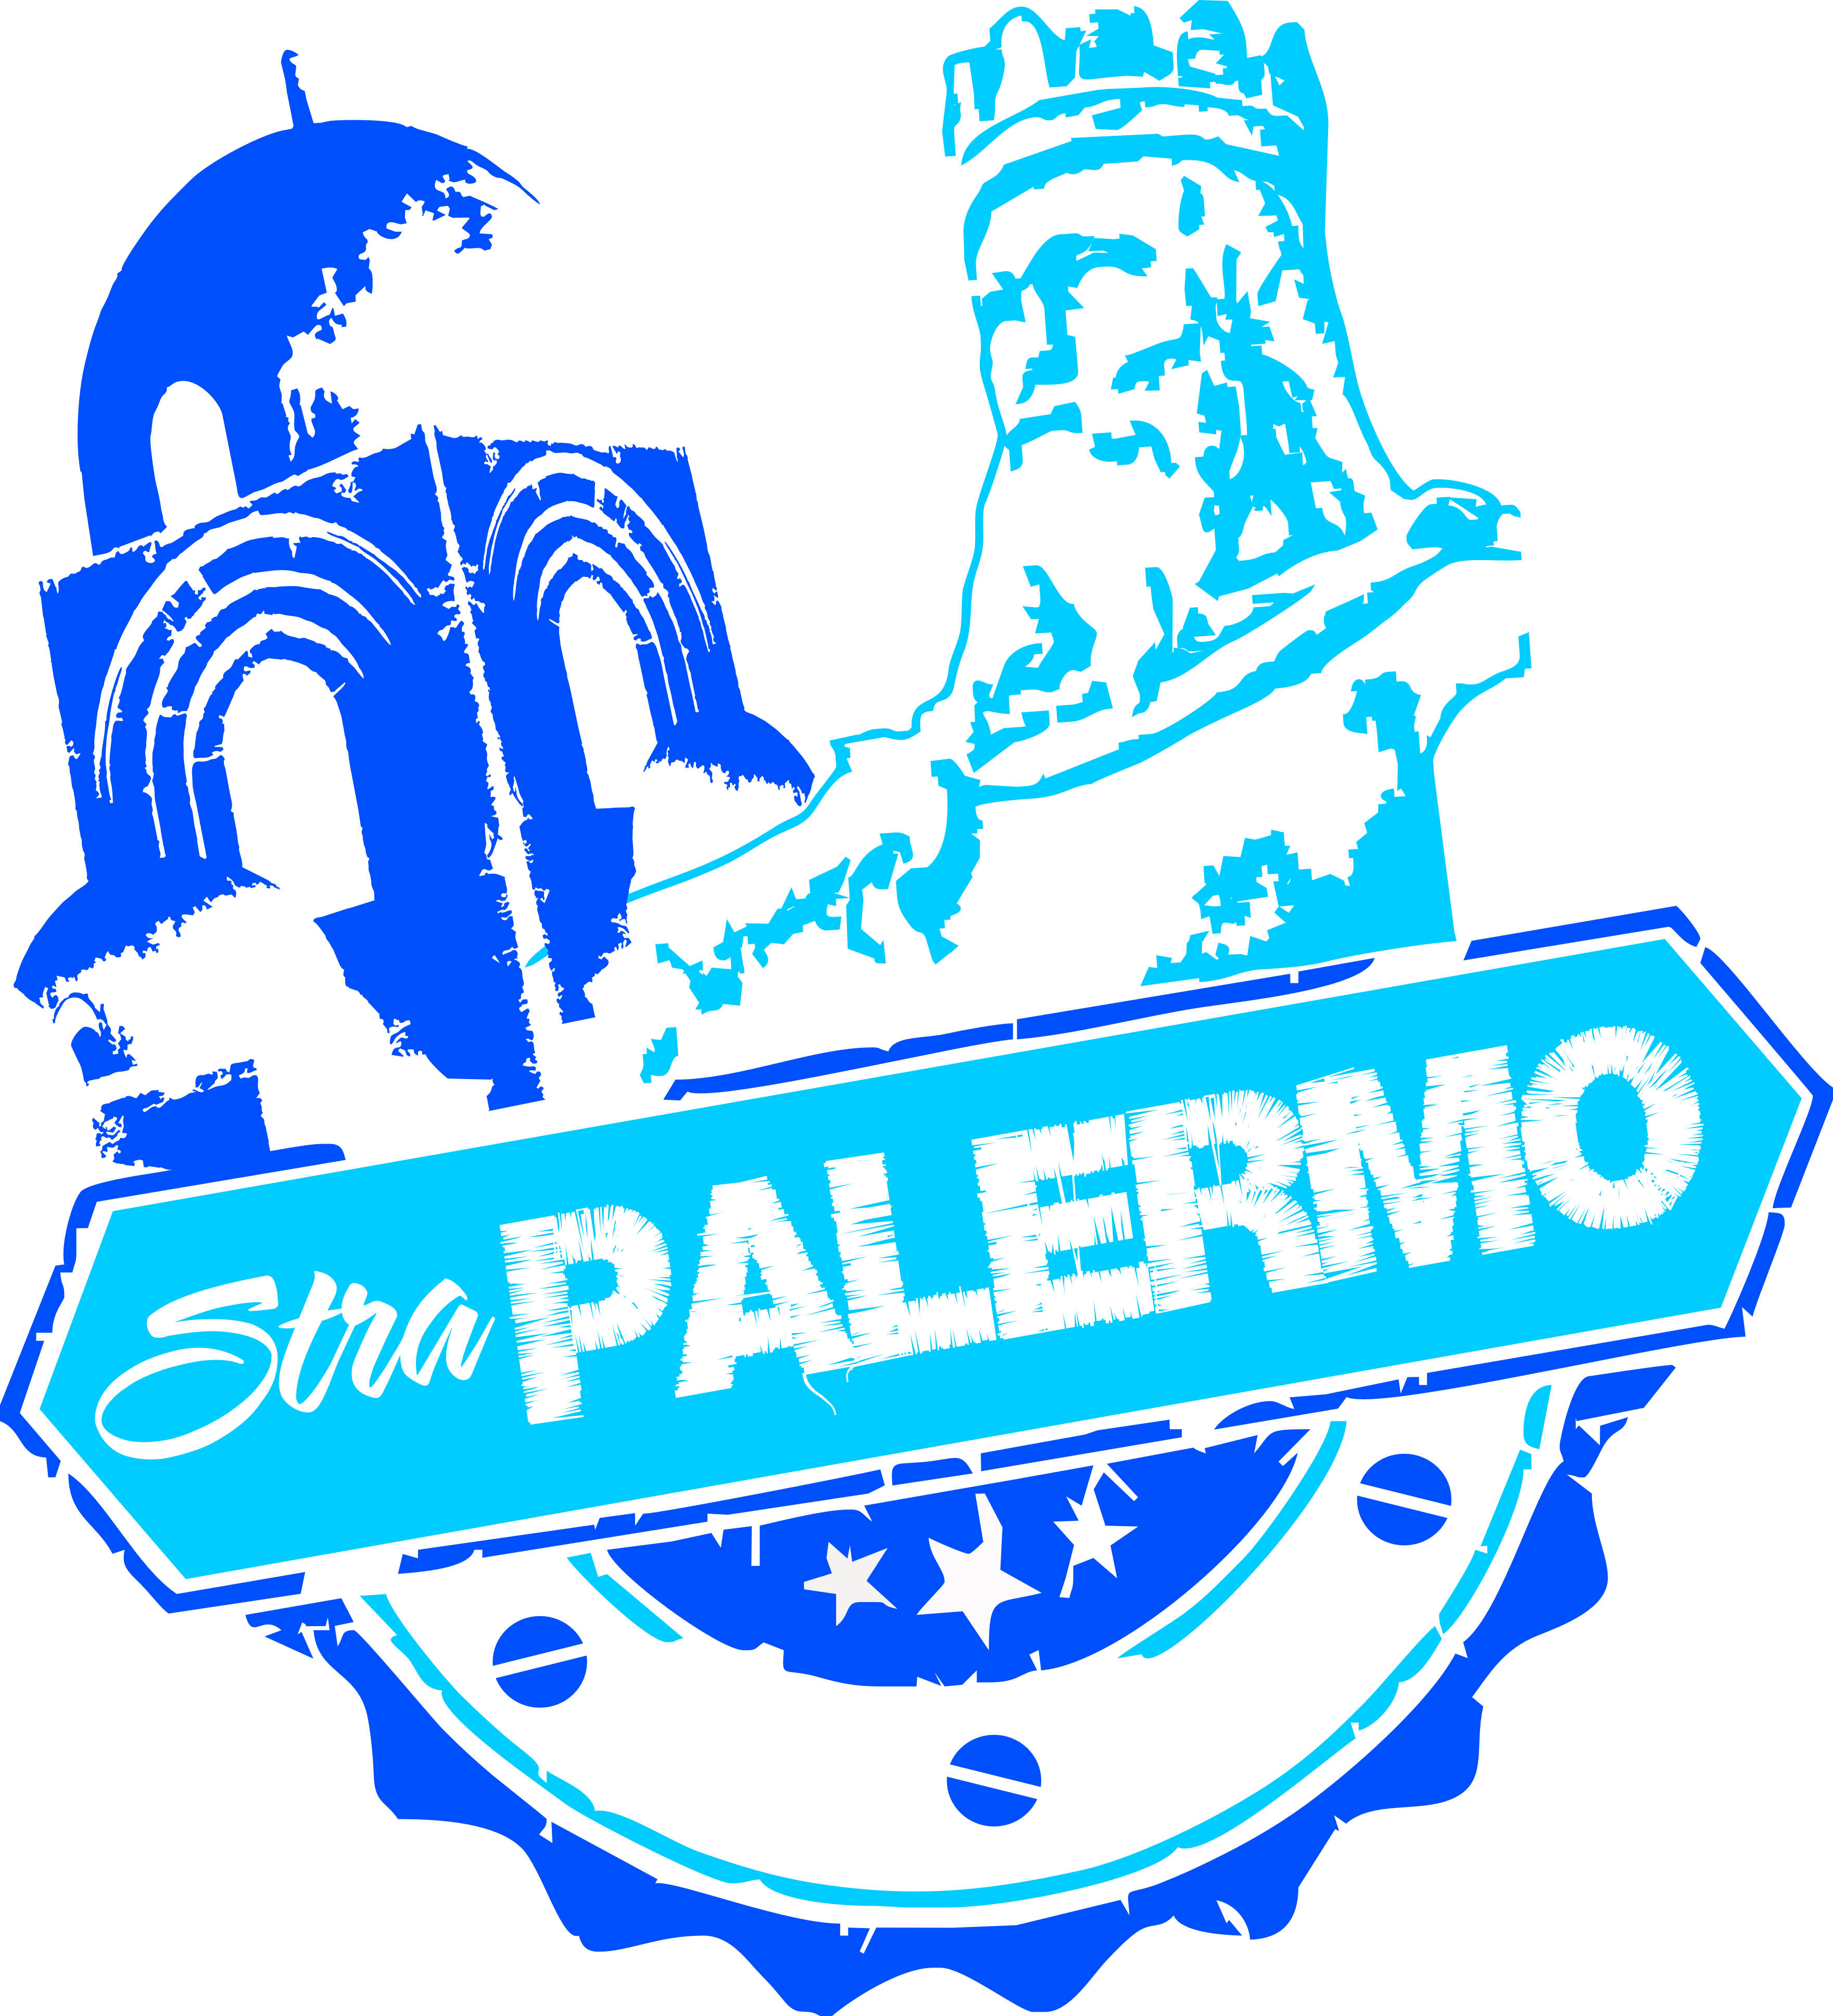 Stra Palermo